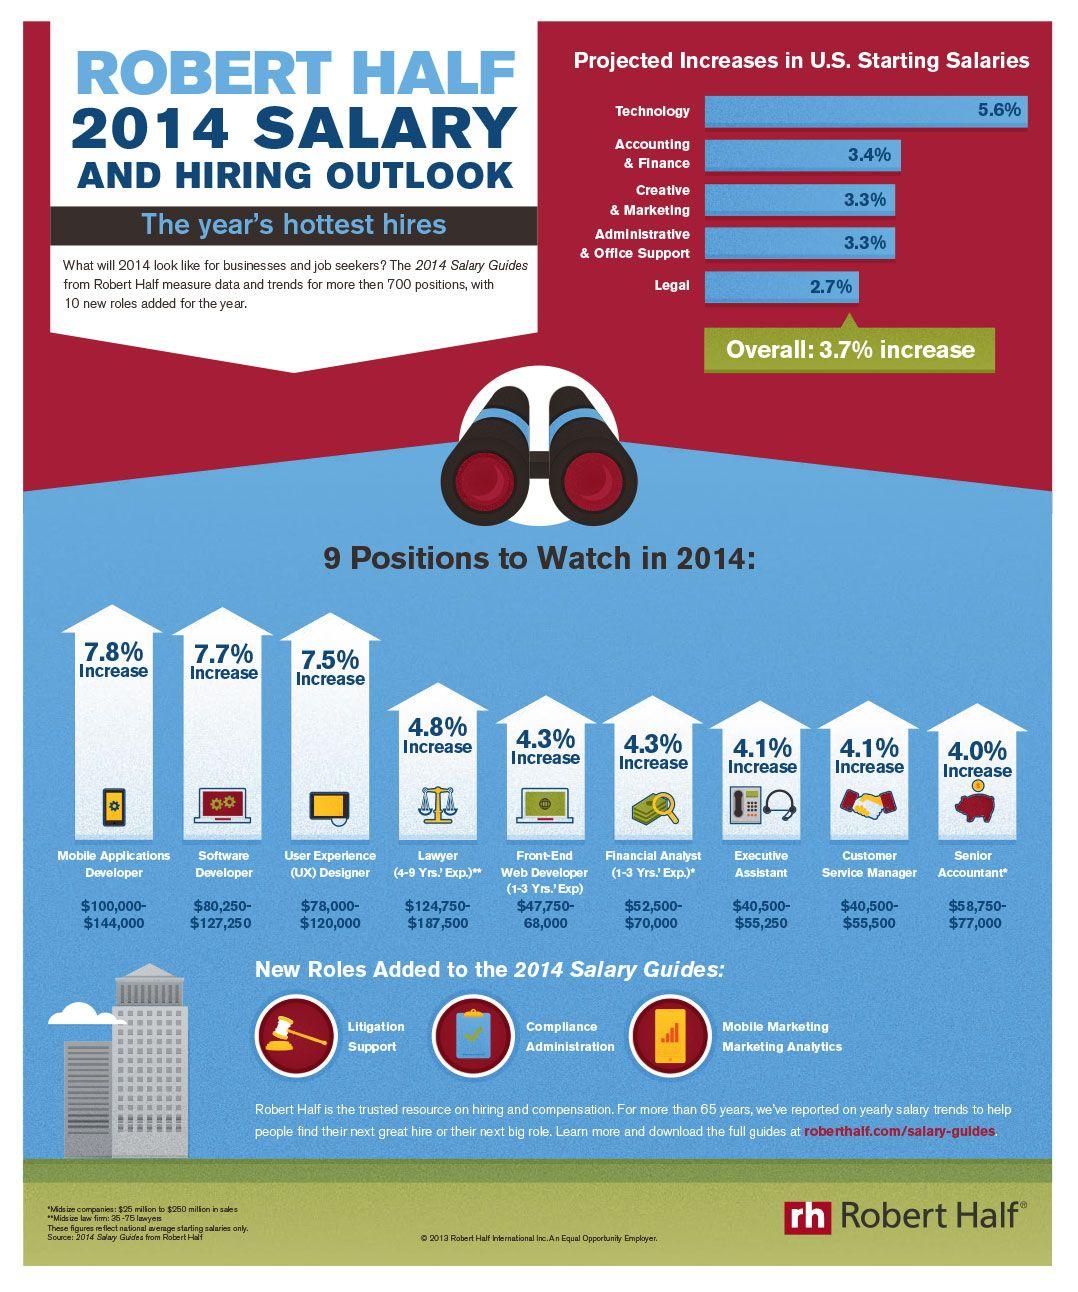 Robert Half 2014 Salary And Hiring Outlook Hottesthires Roberthalf Infographic Web Design Jobs Robert Half Salary Calculator